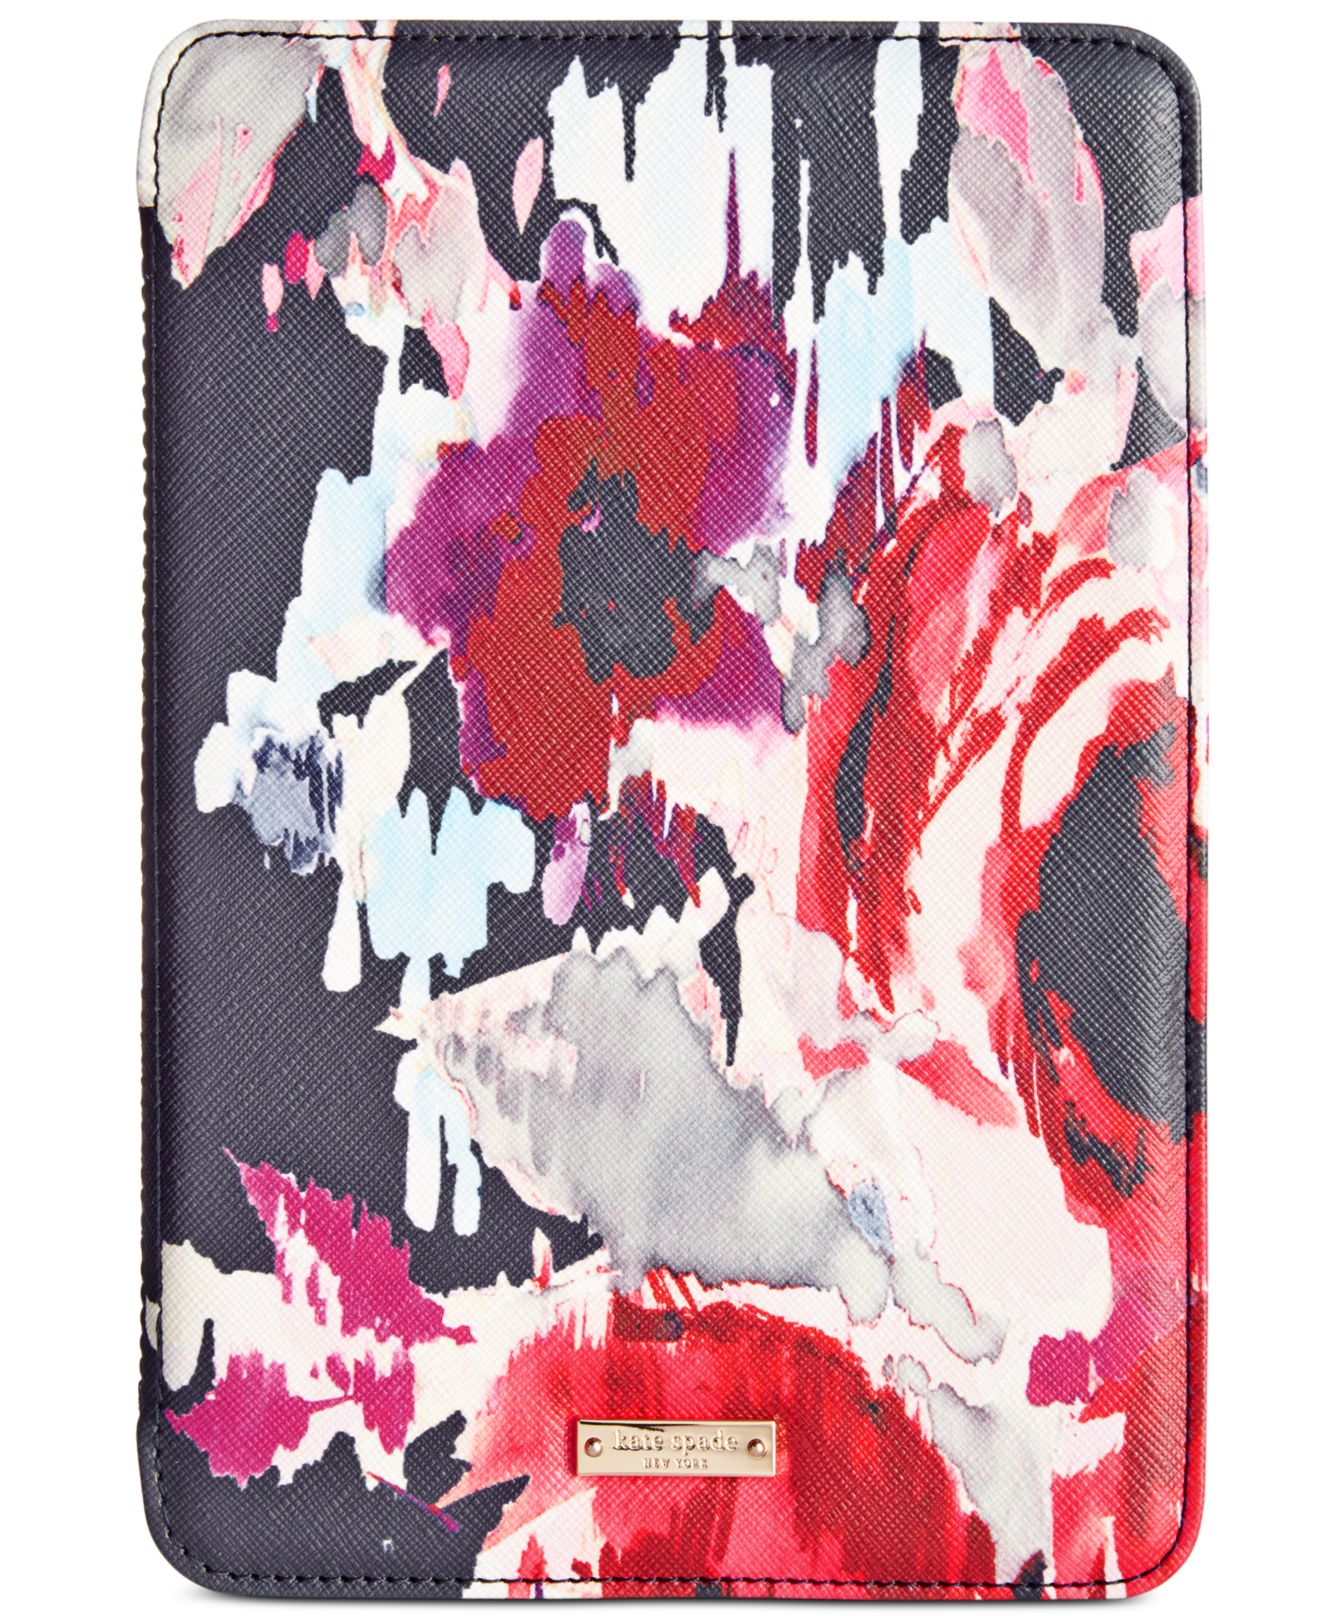 best website 4e0d3 379be kate spade new york Multicolor Hazy Floral Ipad Mini 2 3 Folio Case